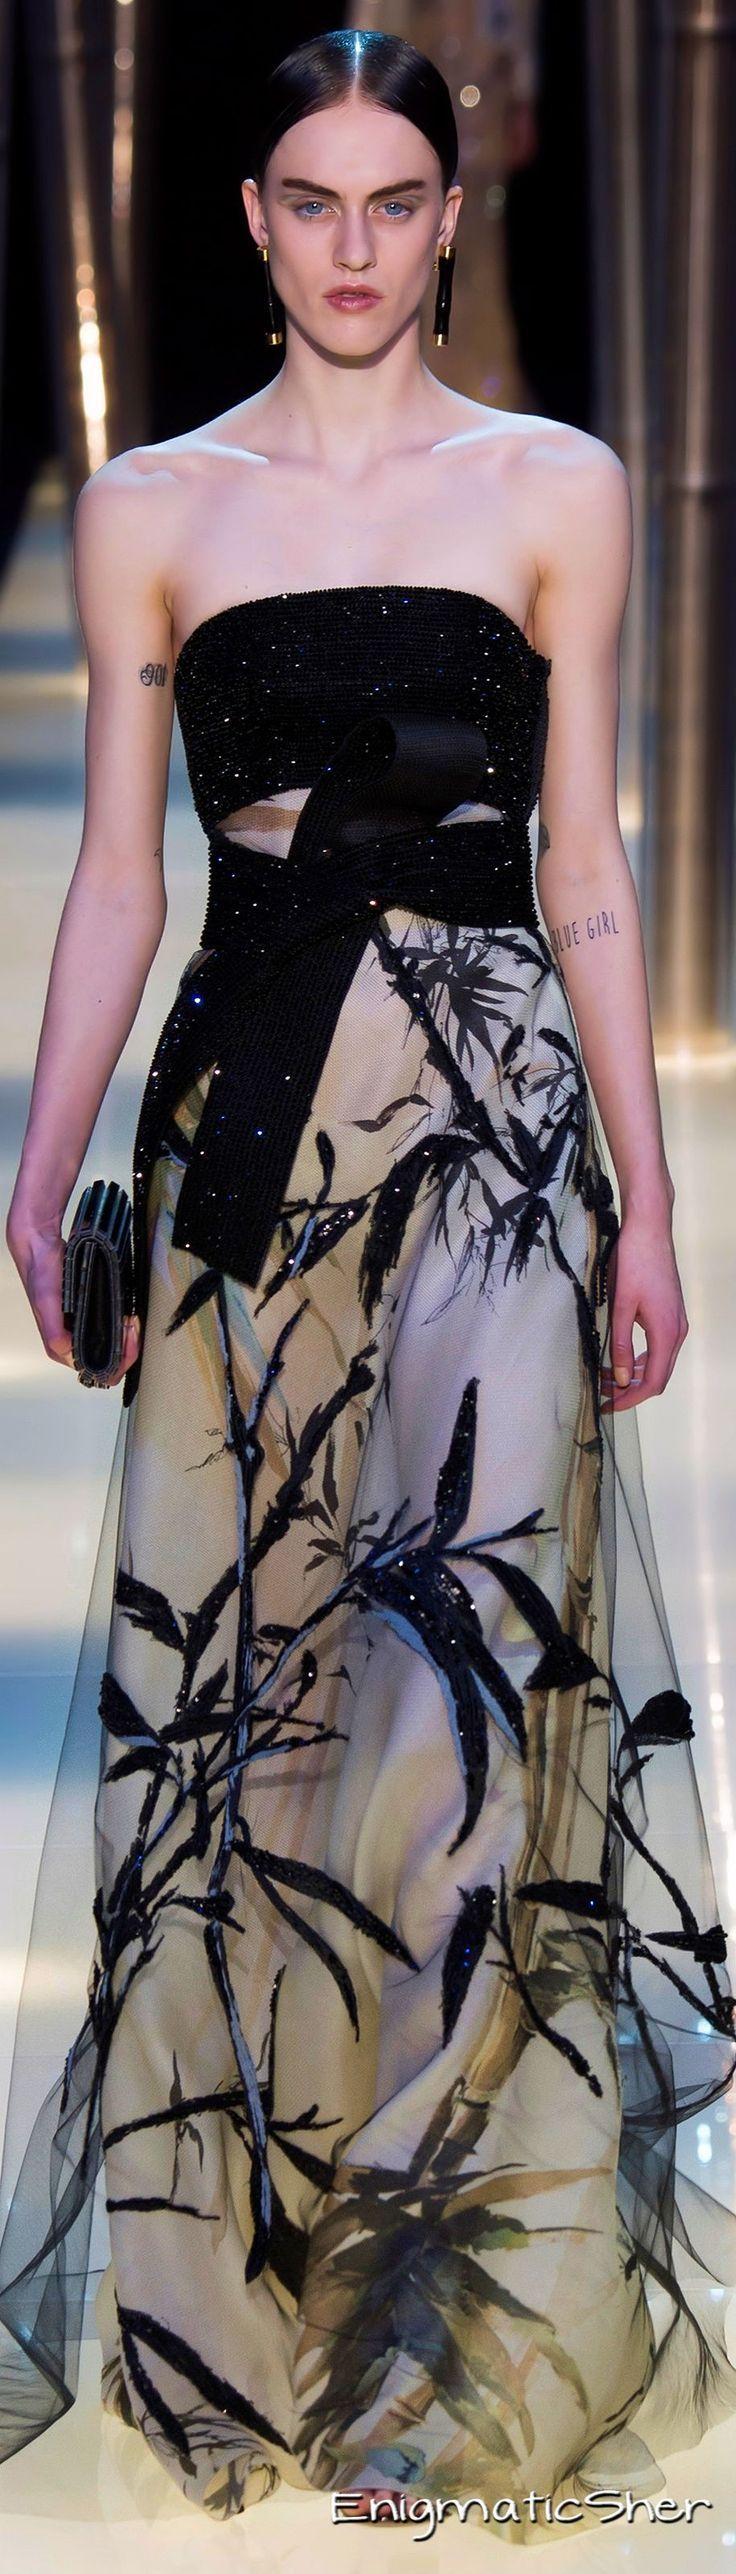 Georgio Armani Prive ~ Haute Couture Summer Sleeveless Black + White Gown 2015